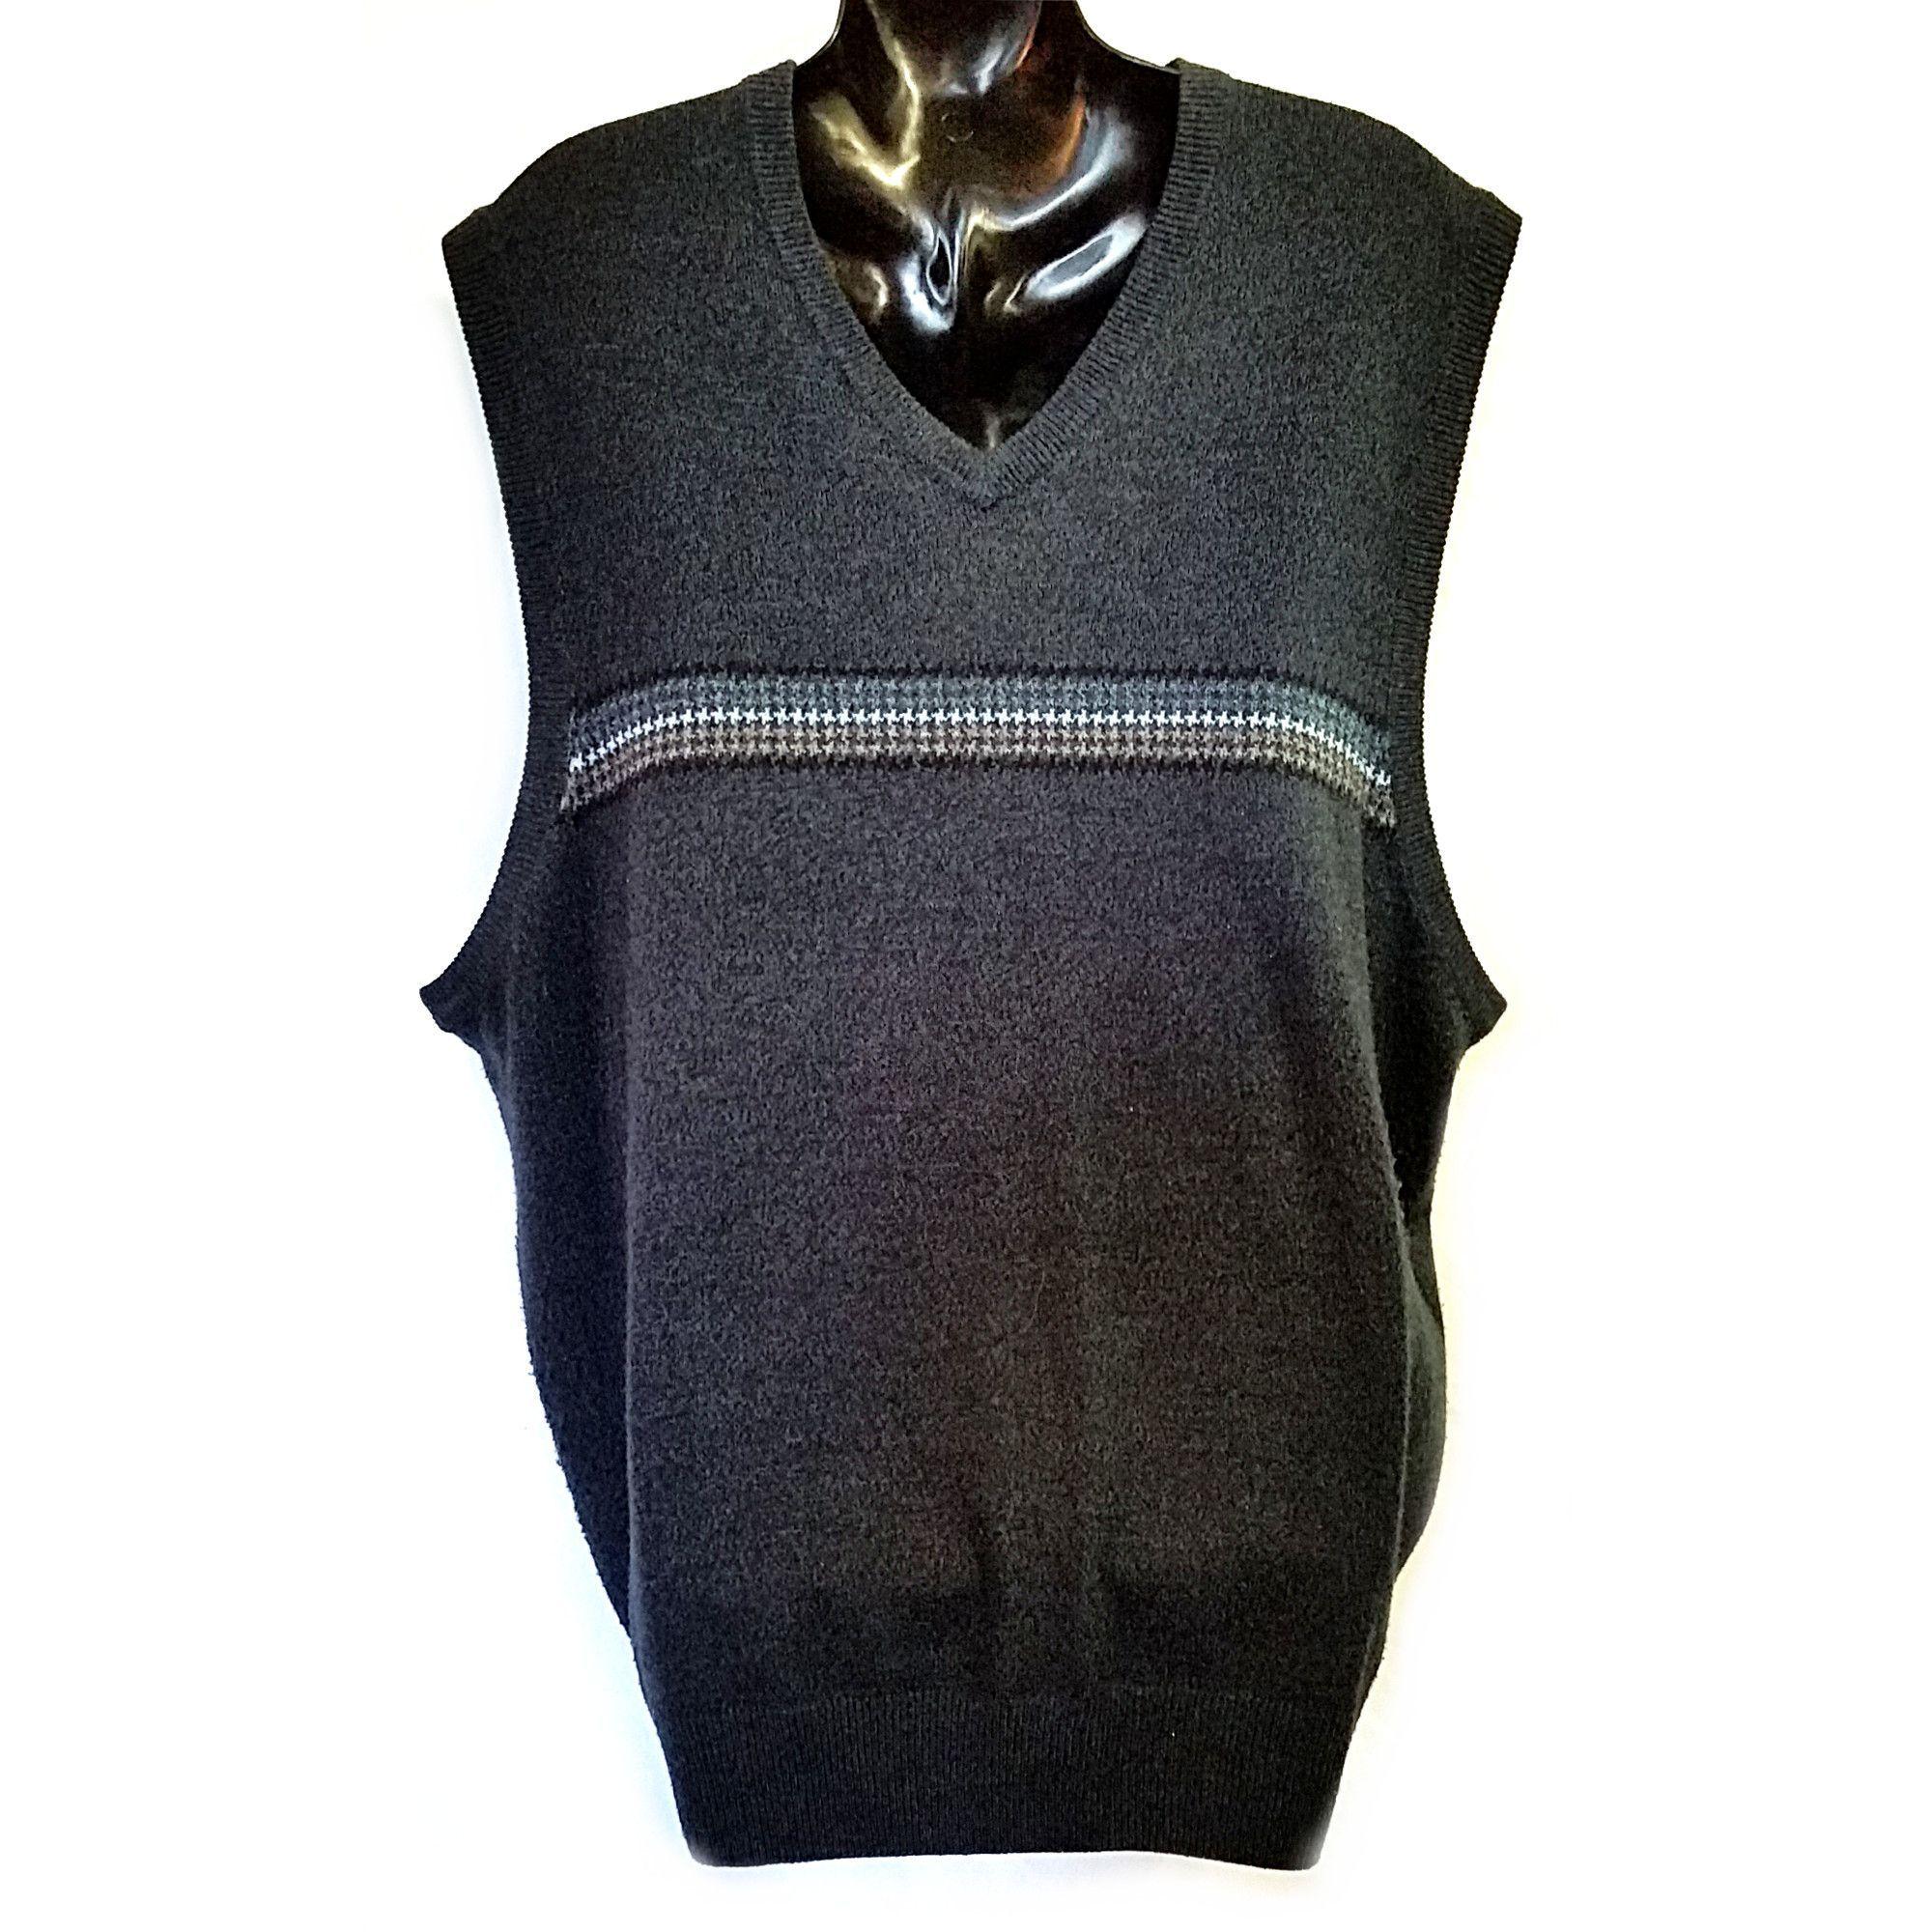 Dark Gray Sweater Vest Mens XXL Dockers Business f202 | Cardigans ...